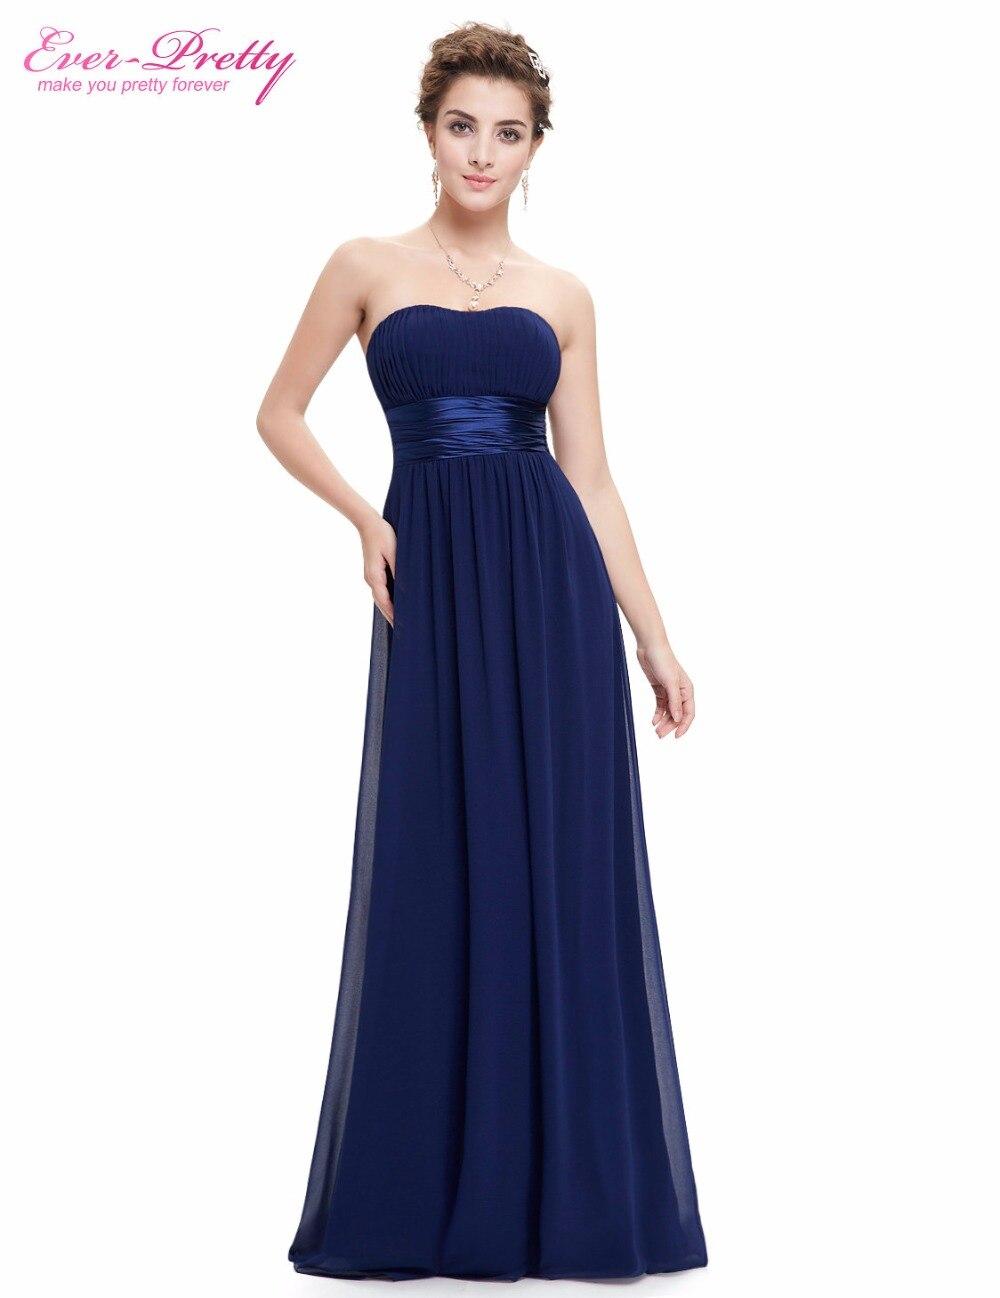 Long black chiffon strapless dress